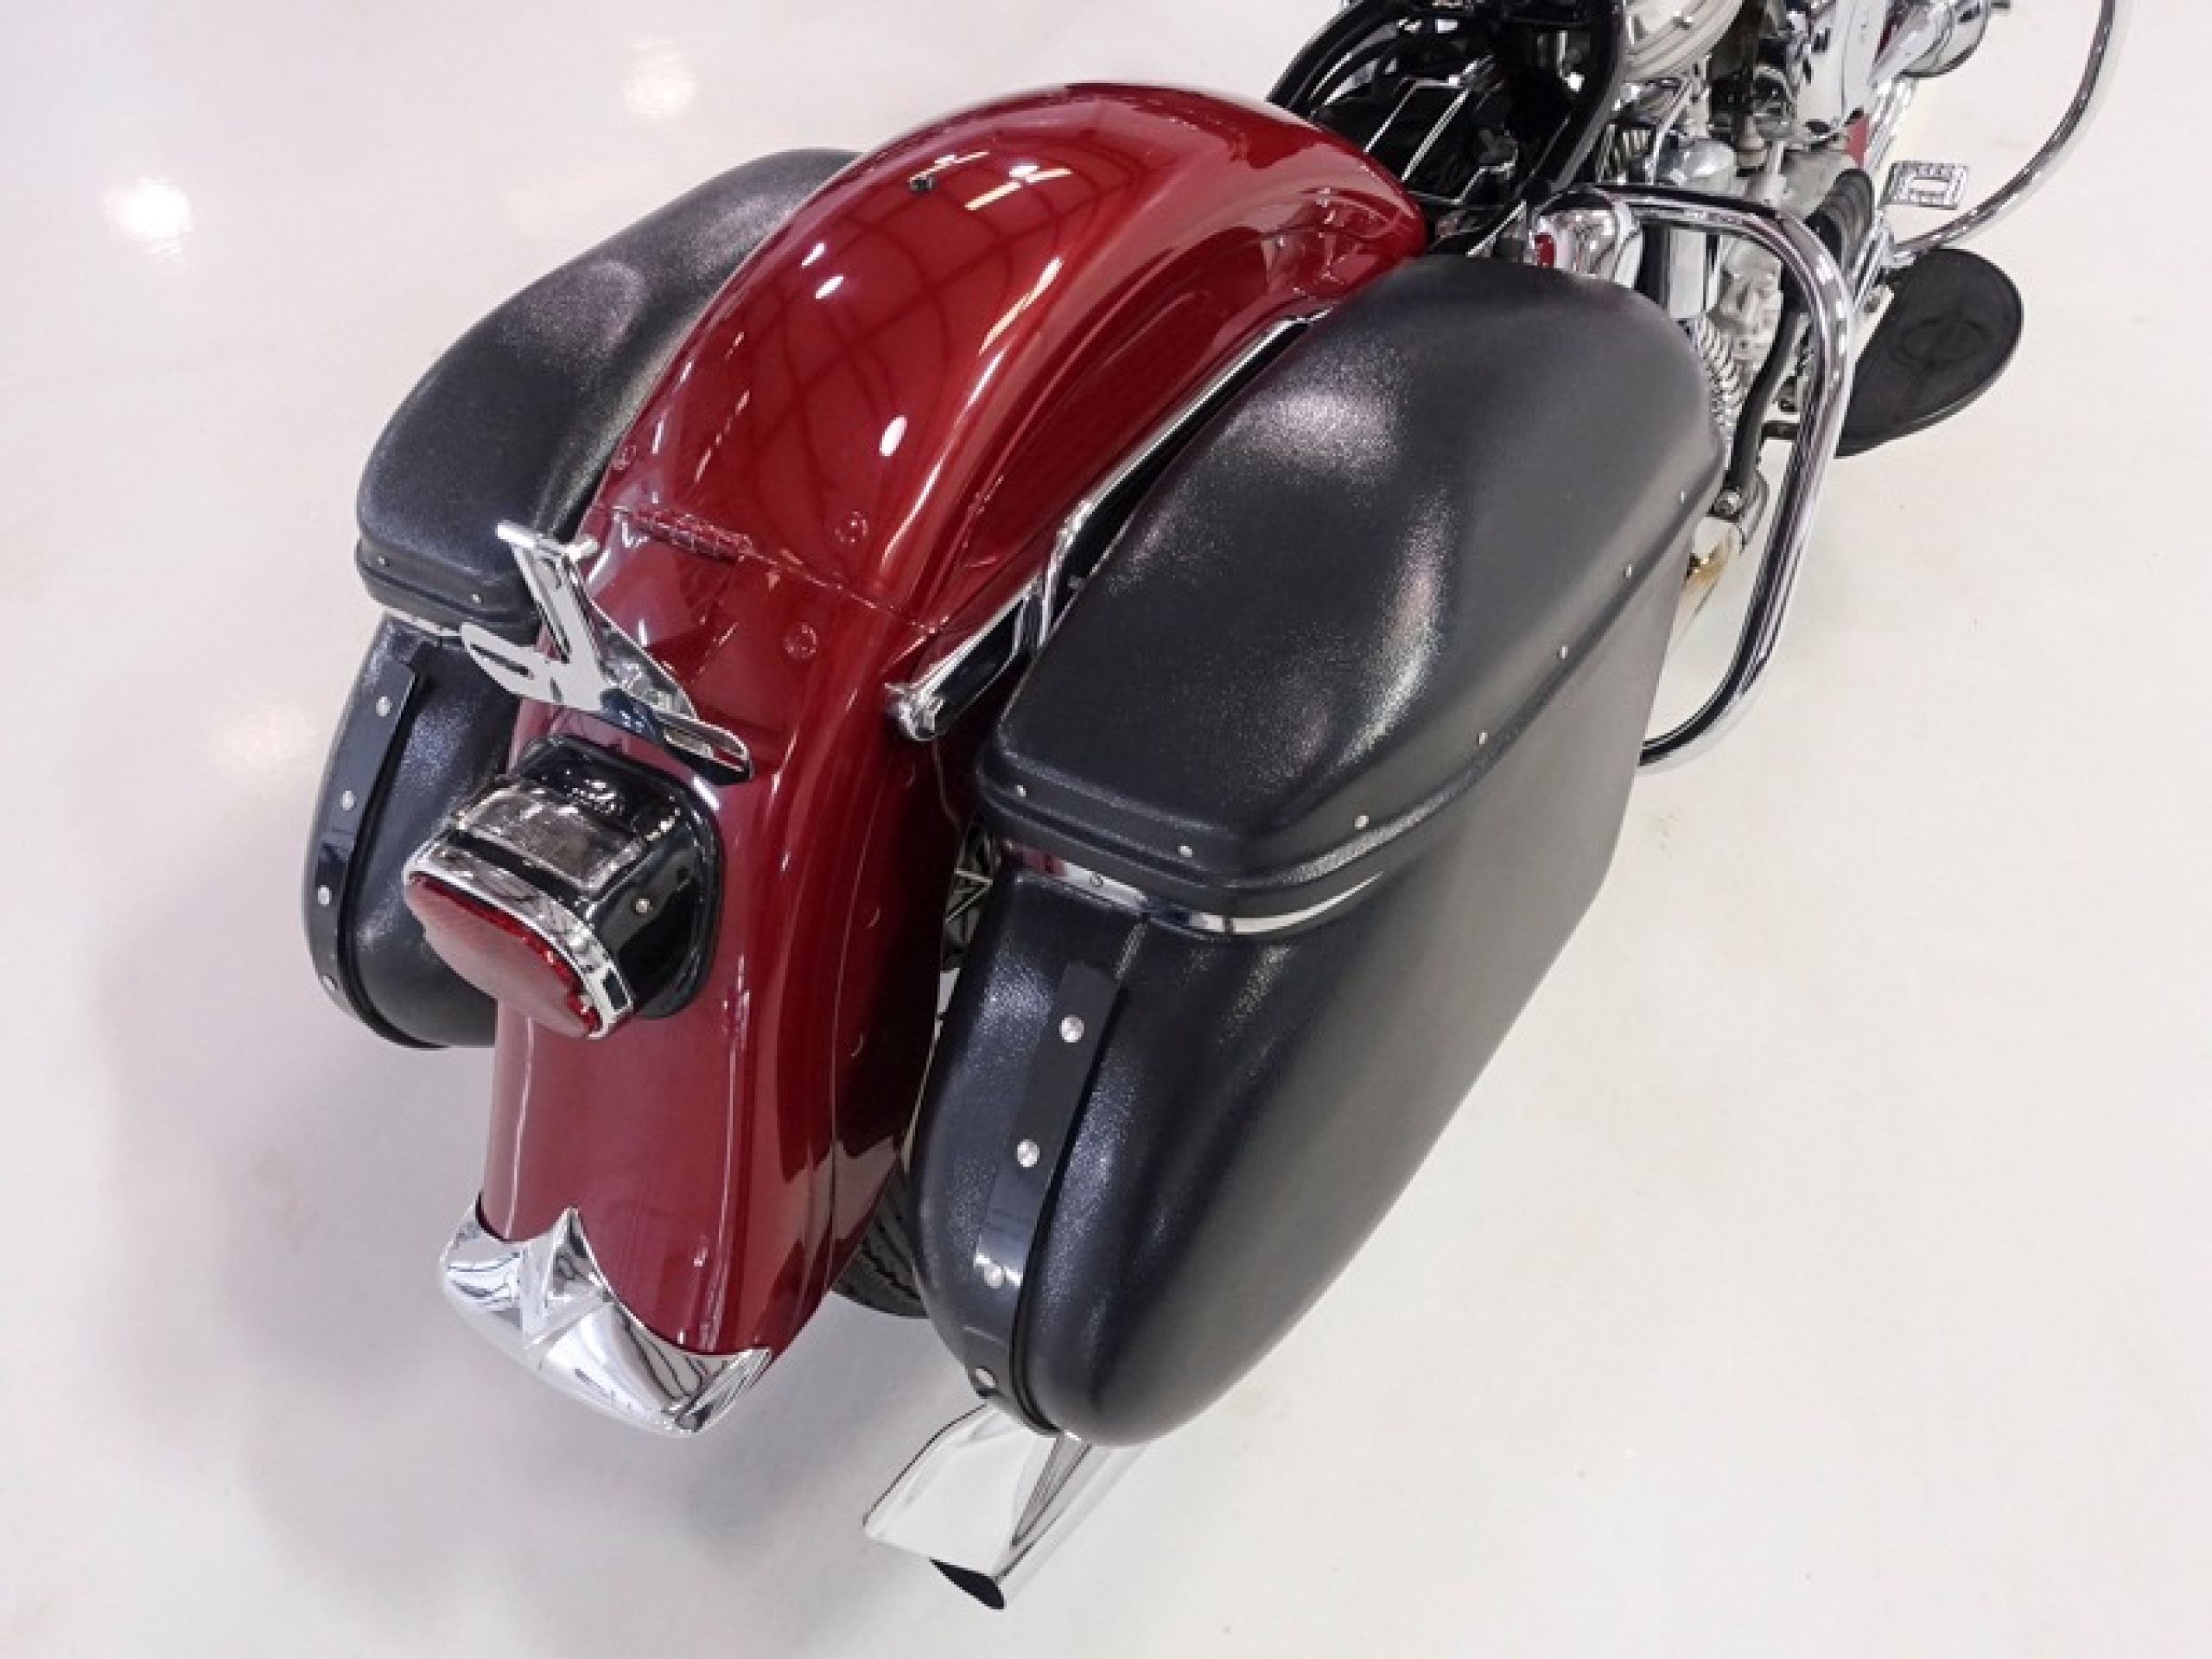 1961 Harley-Davidson Duo-Glide